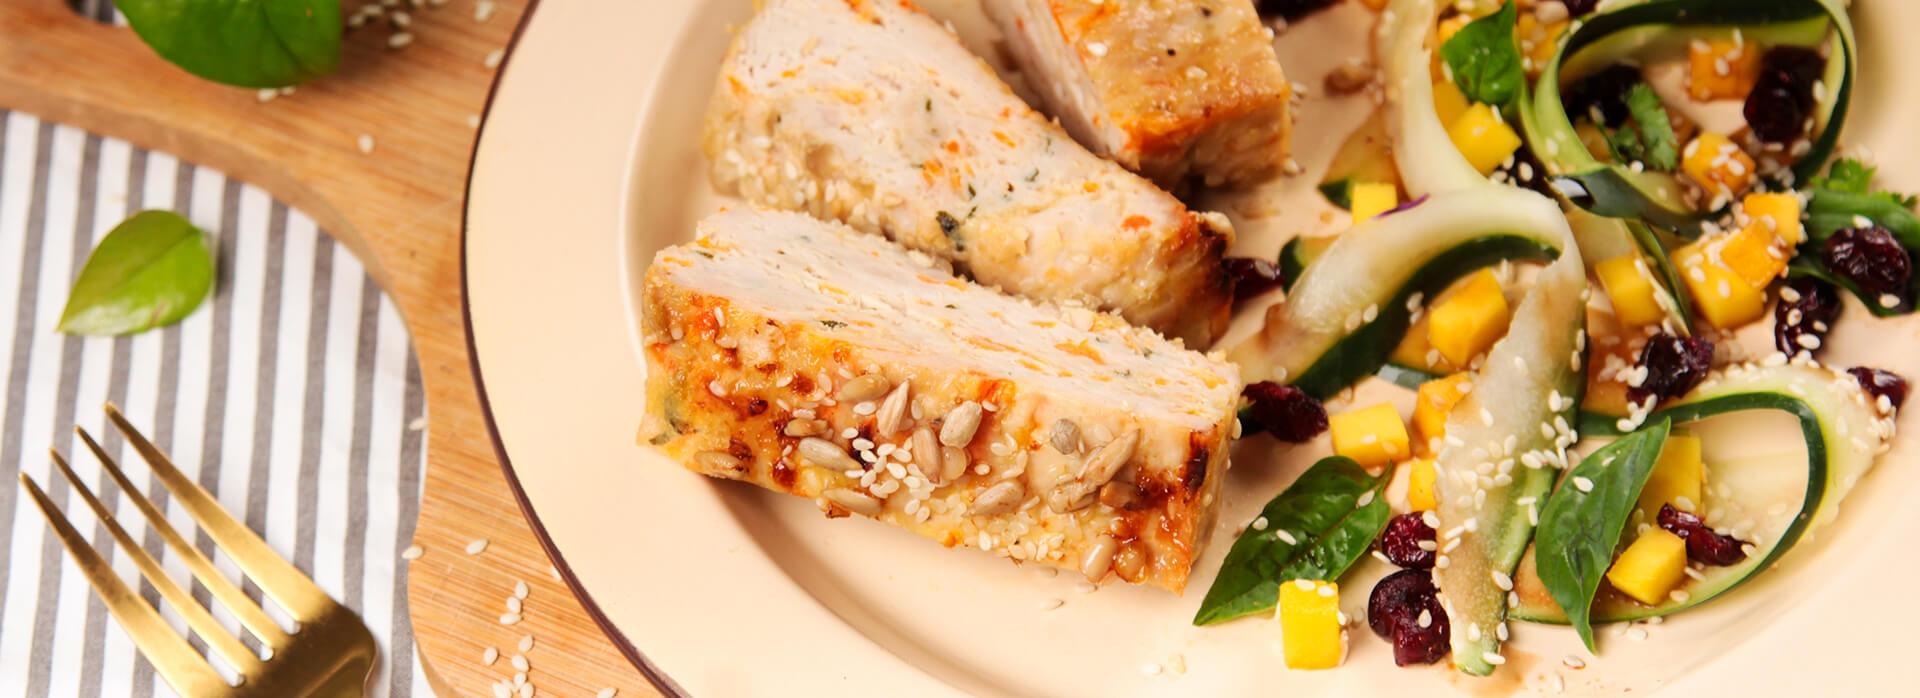 Receta de terrina de pollo y zanahoria